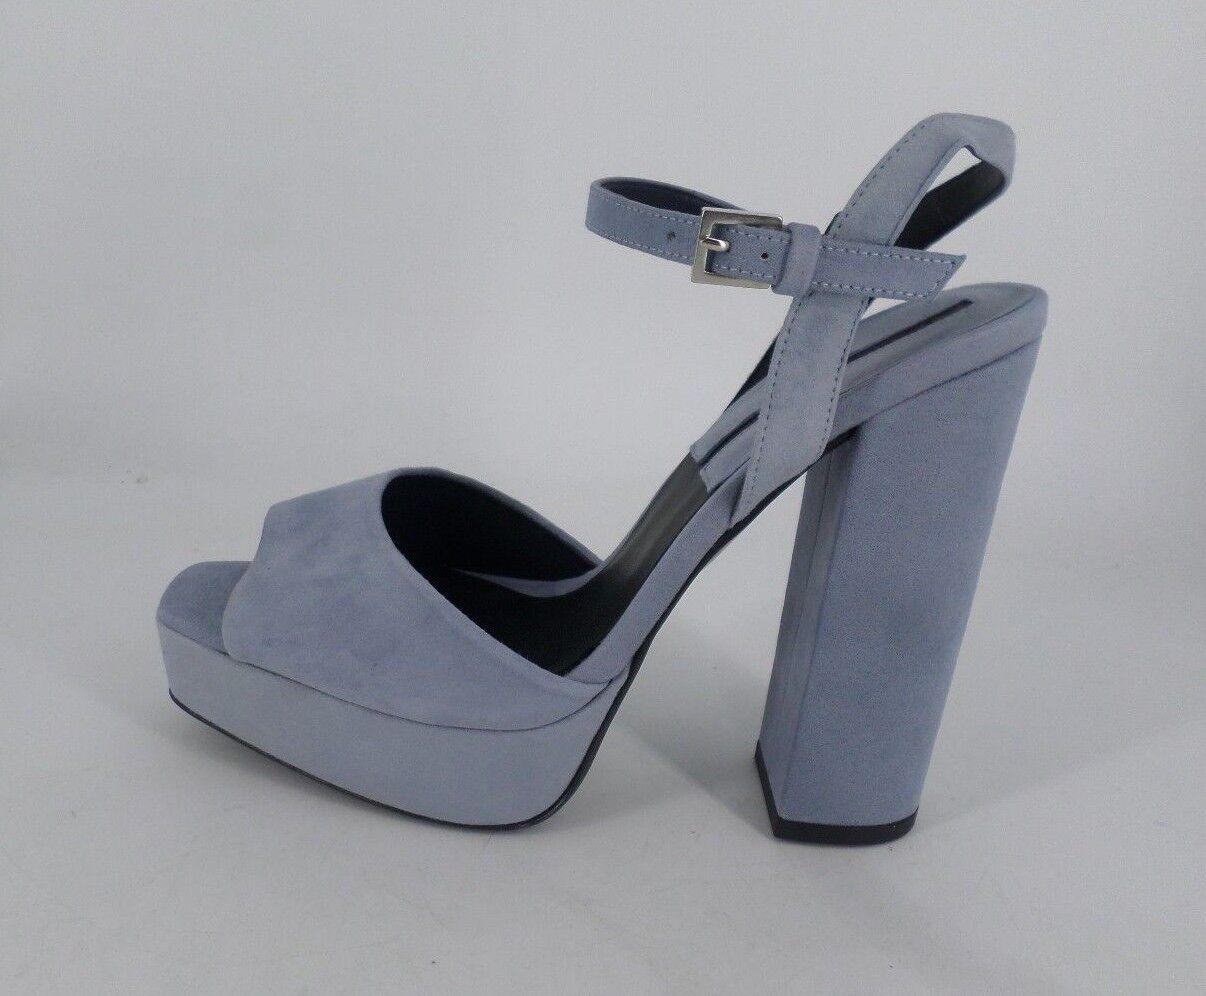 Zara Sandalias de de de plataforma de ante azul UK 5 EU 38 JS52 37  venta mundialmente famosa en línea